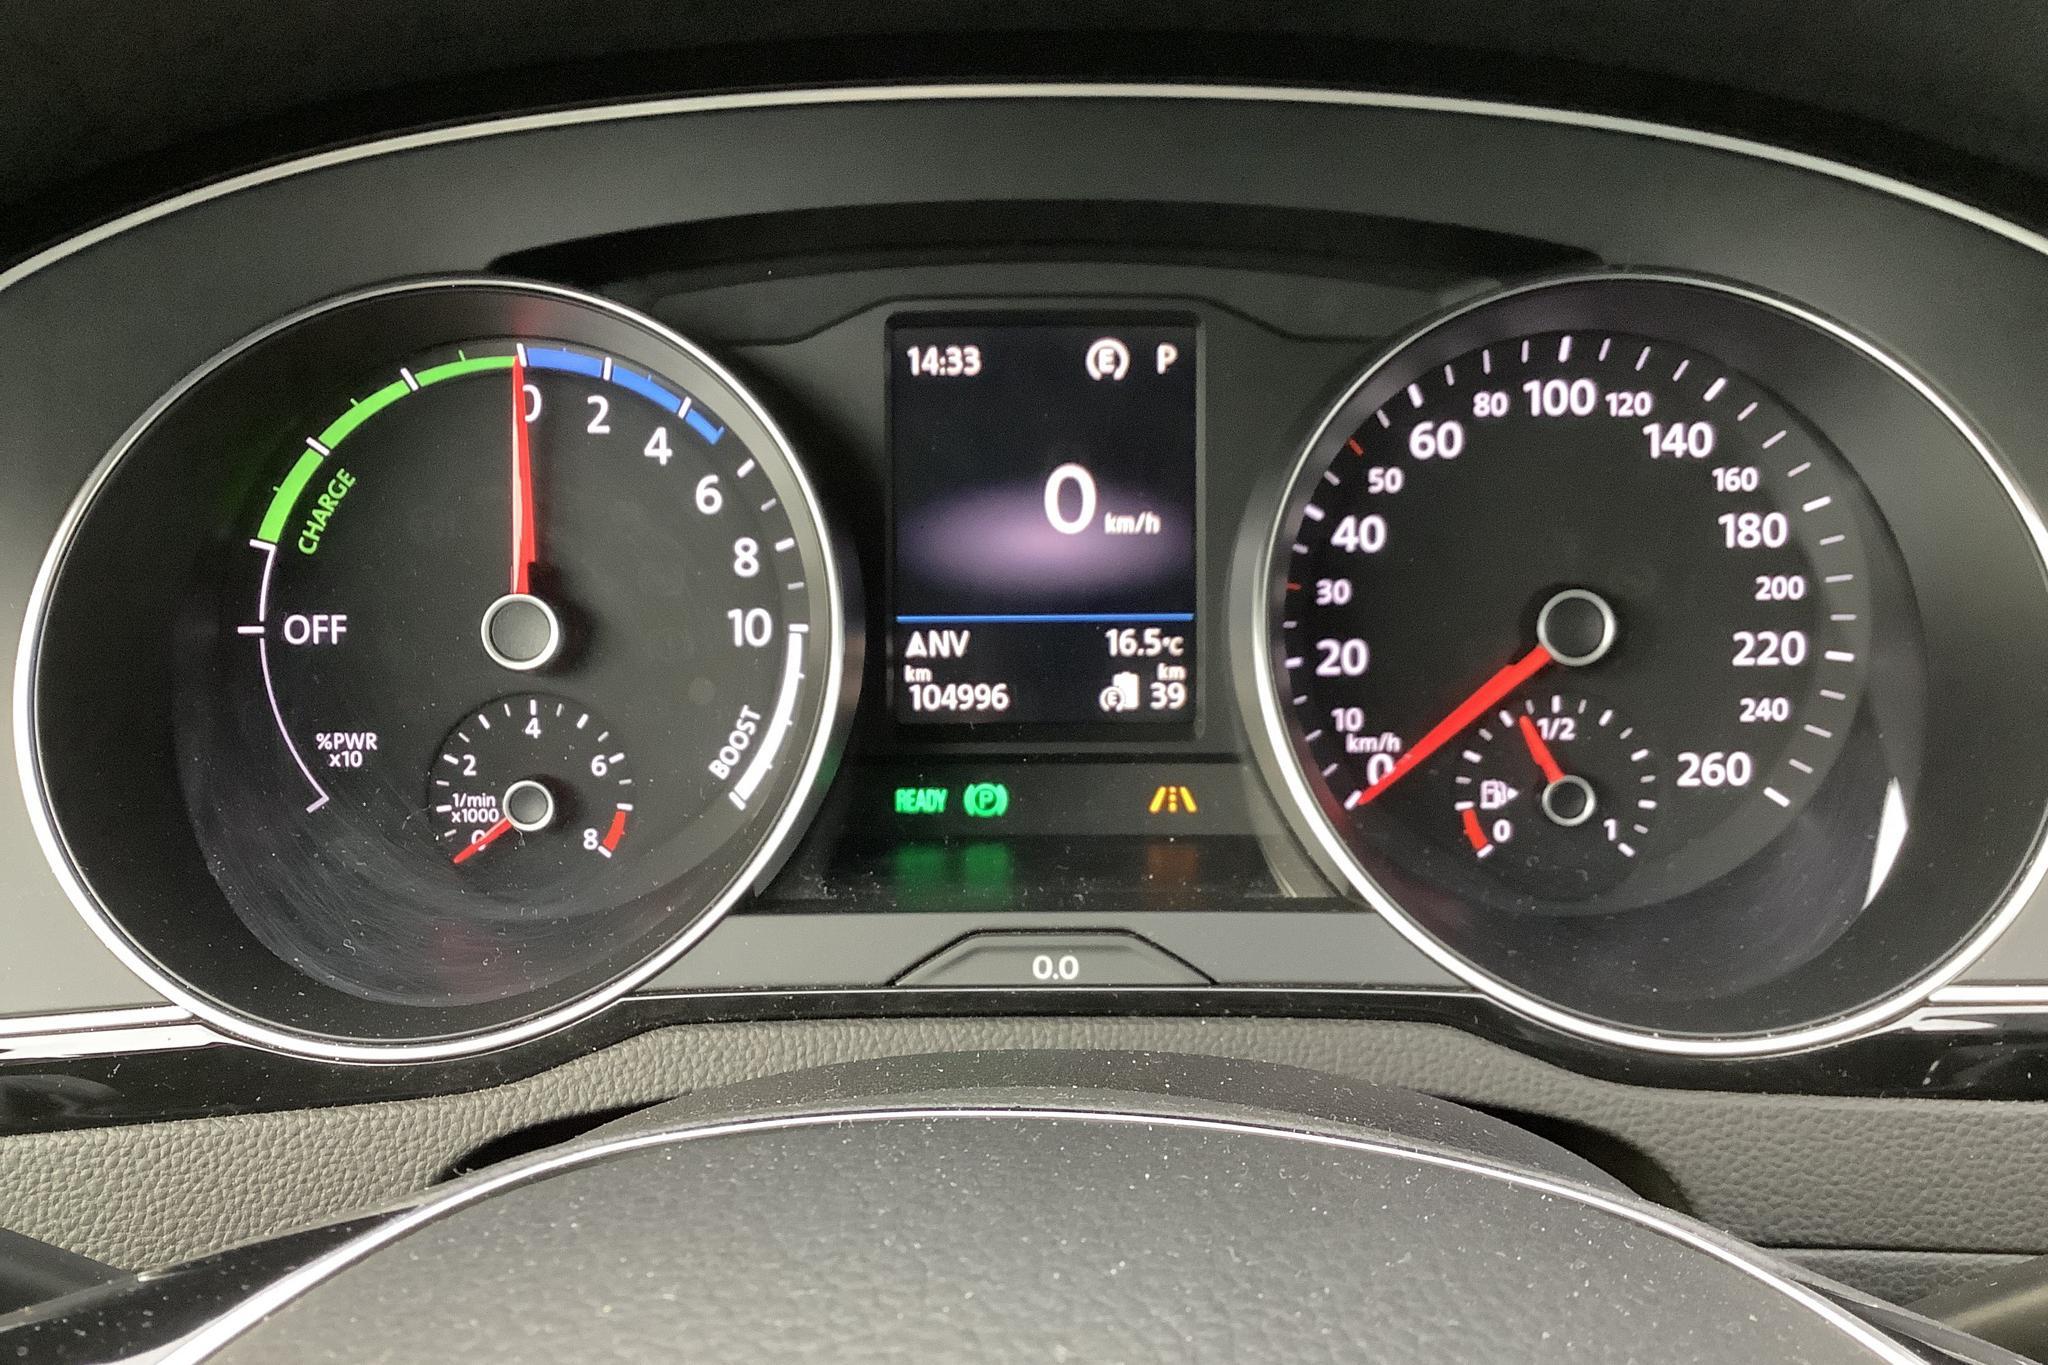 VW Passat 1.4 Plug-in-Hybrid Sportscombi (218hk) - 104 990 km - Automatic - black - 2017